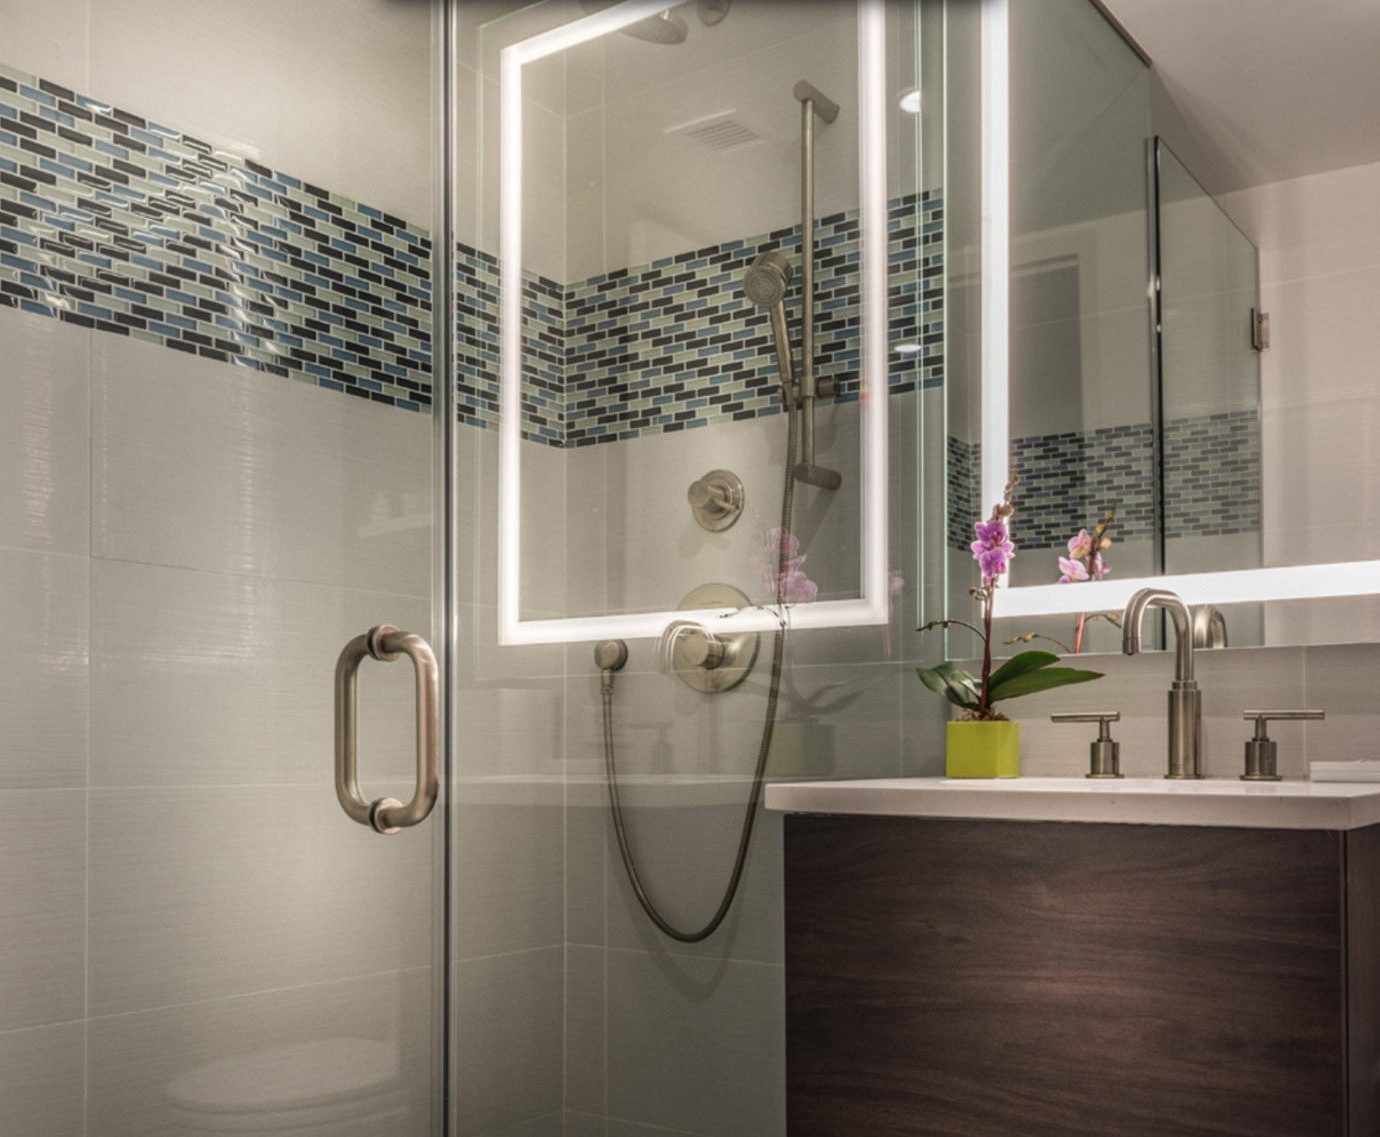 bathroom property plumbing fixture flooring sink tile tiled